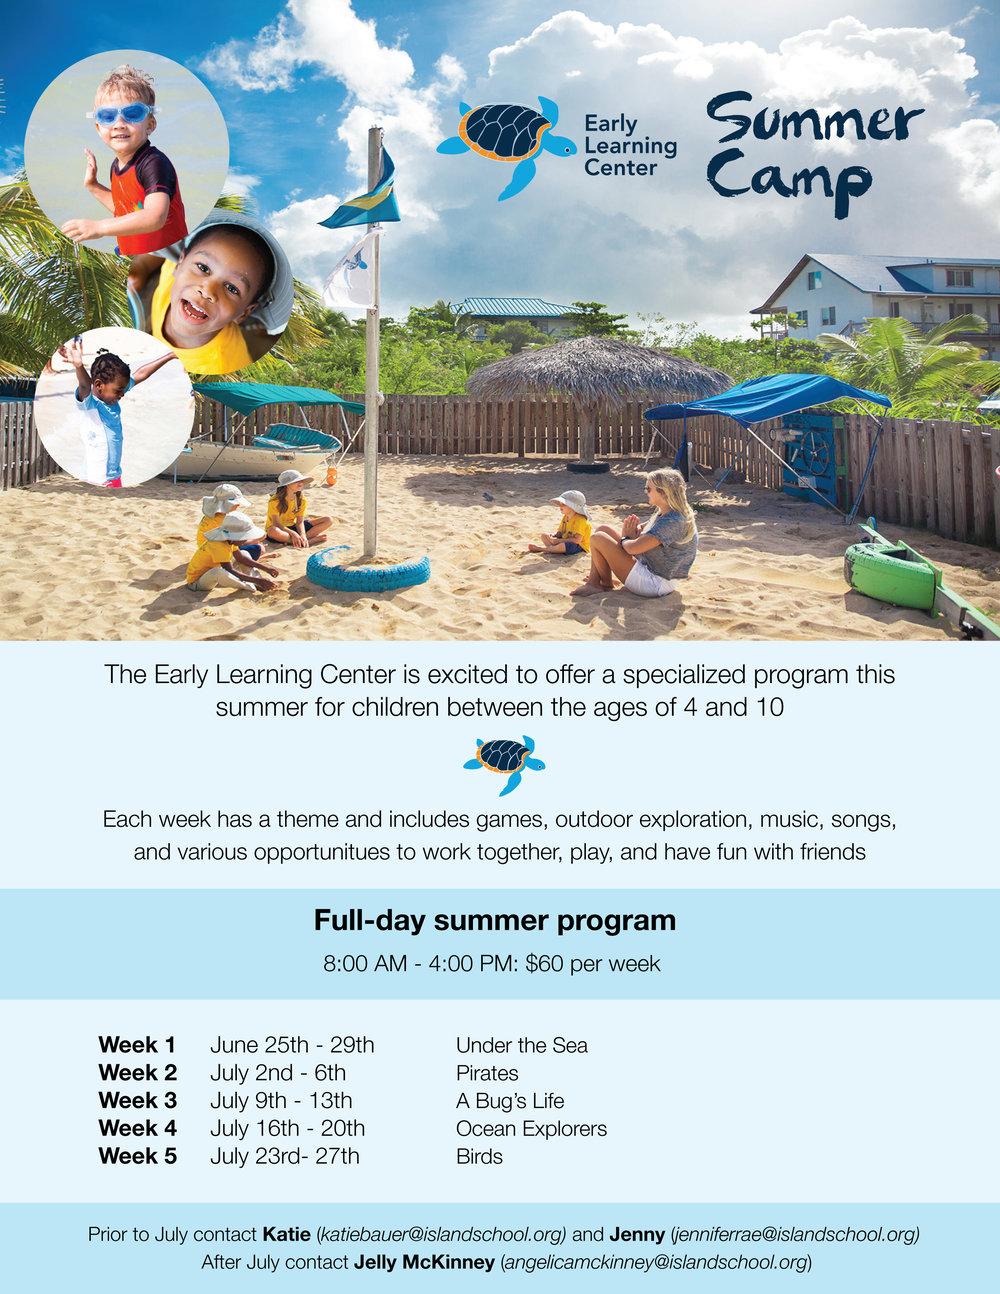 ELC_SummerCamp-01.jpg